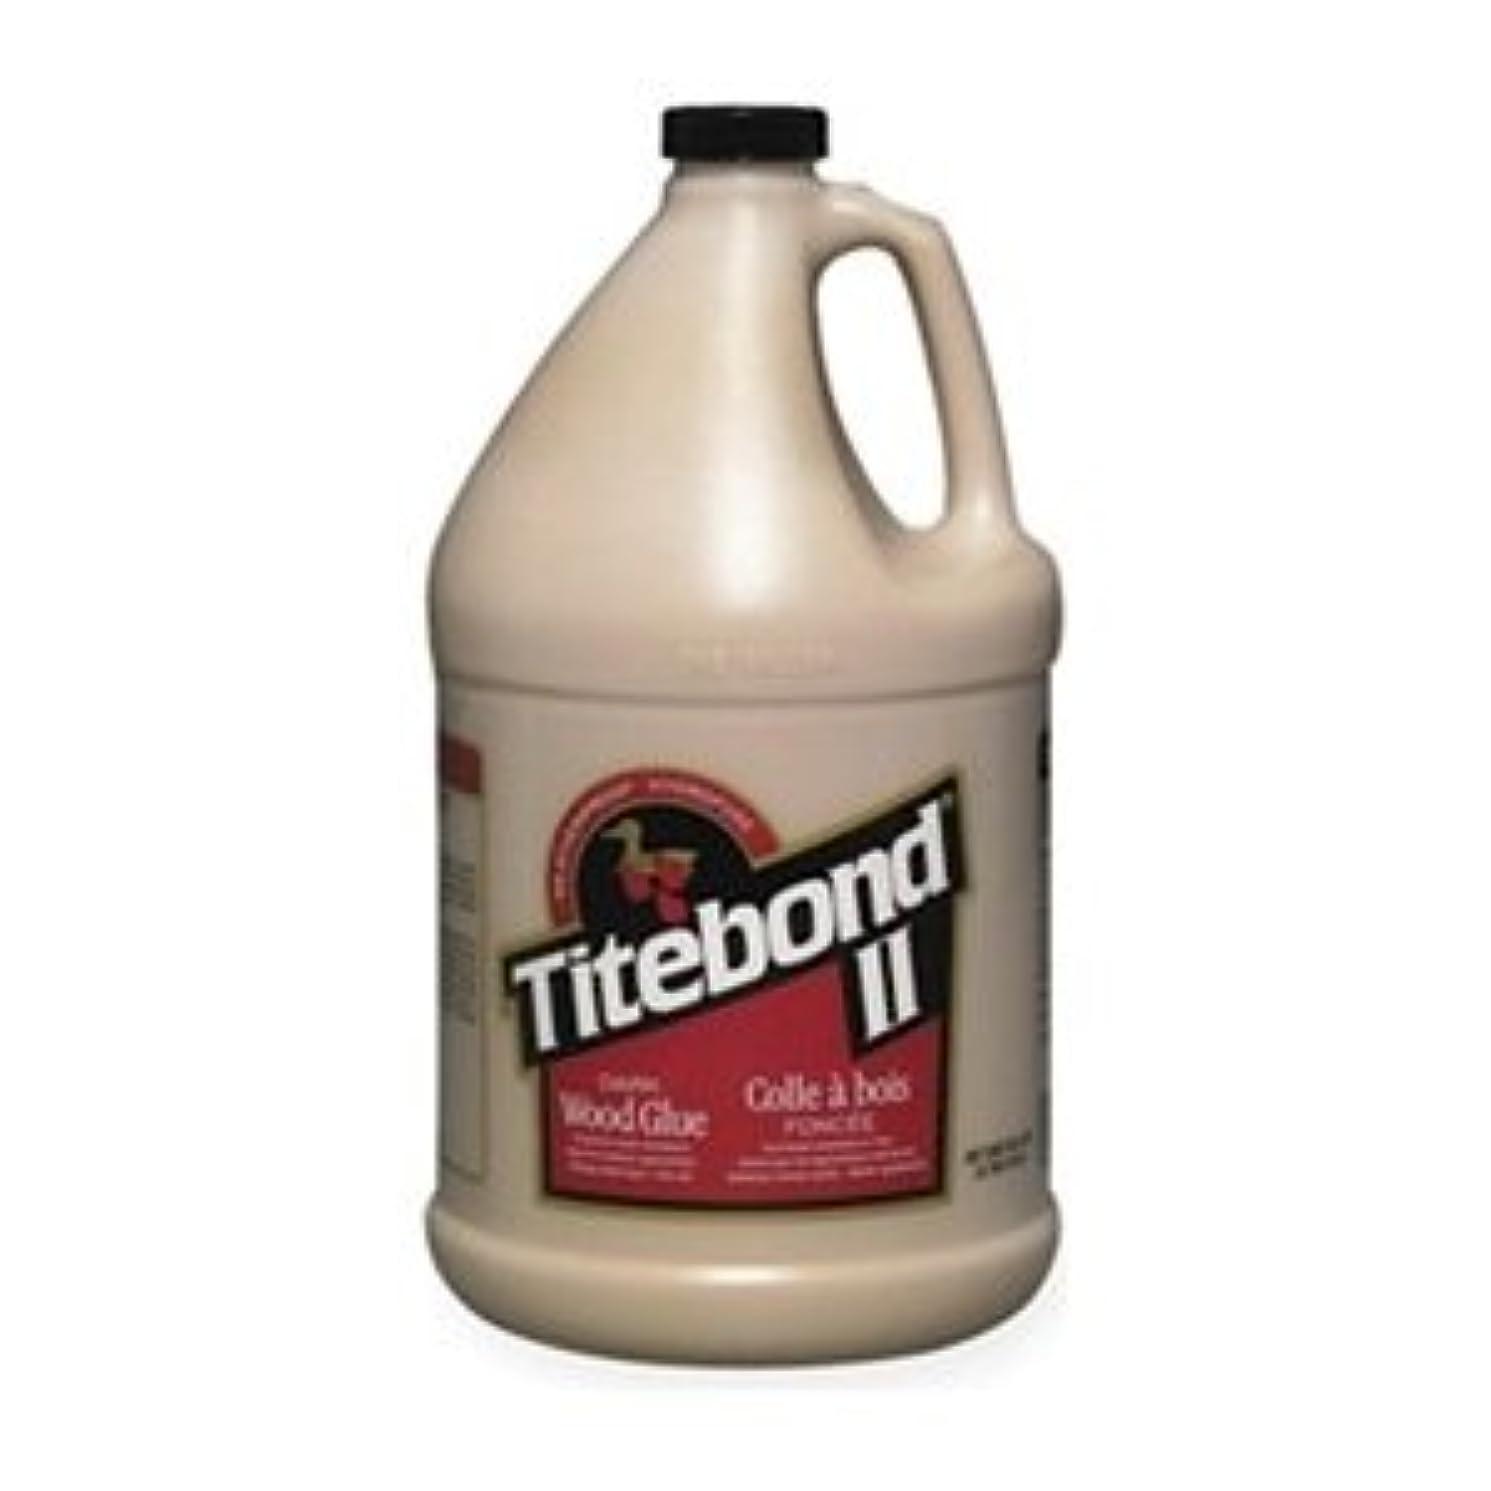 Titebond 3706 Wood Glue, Dark, 1 Gal, Brown